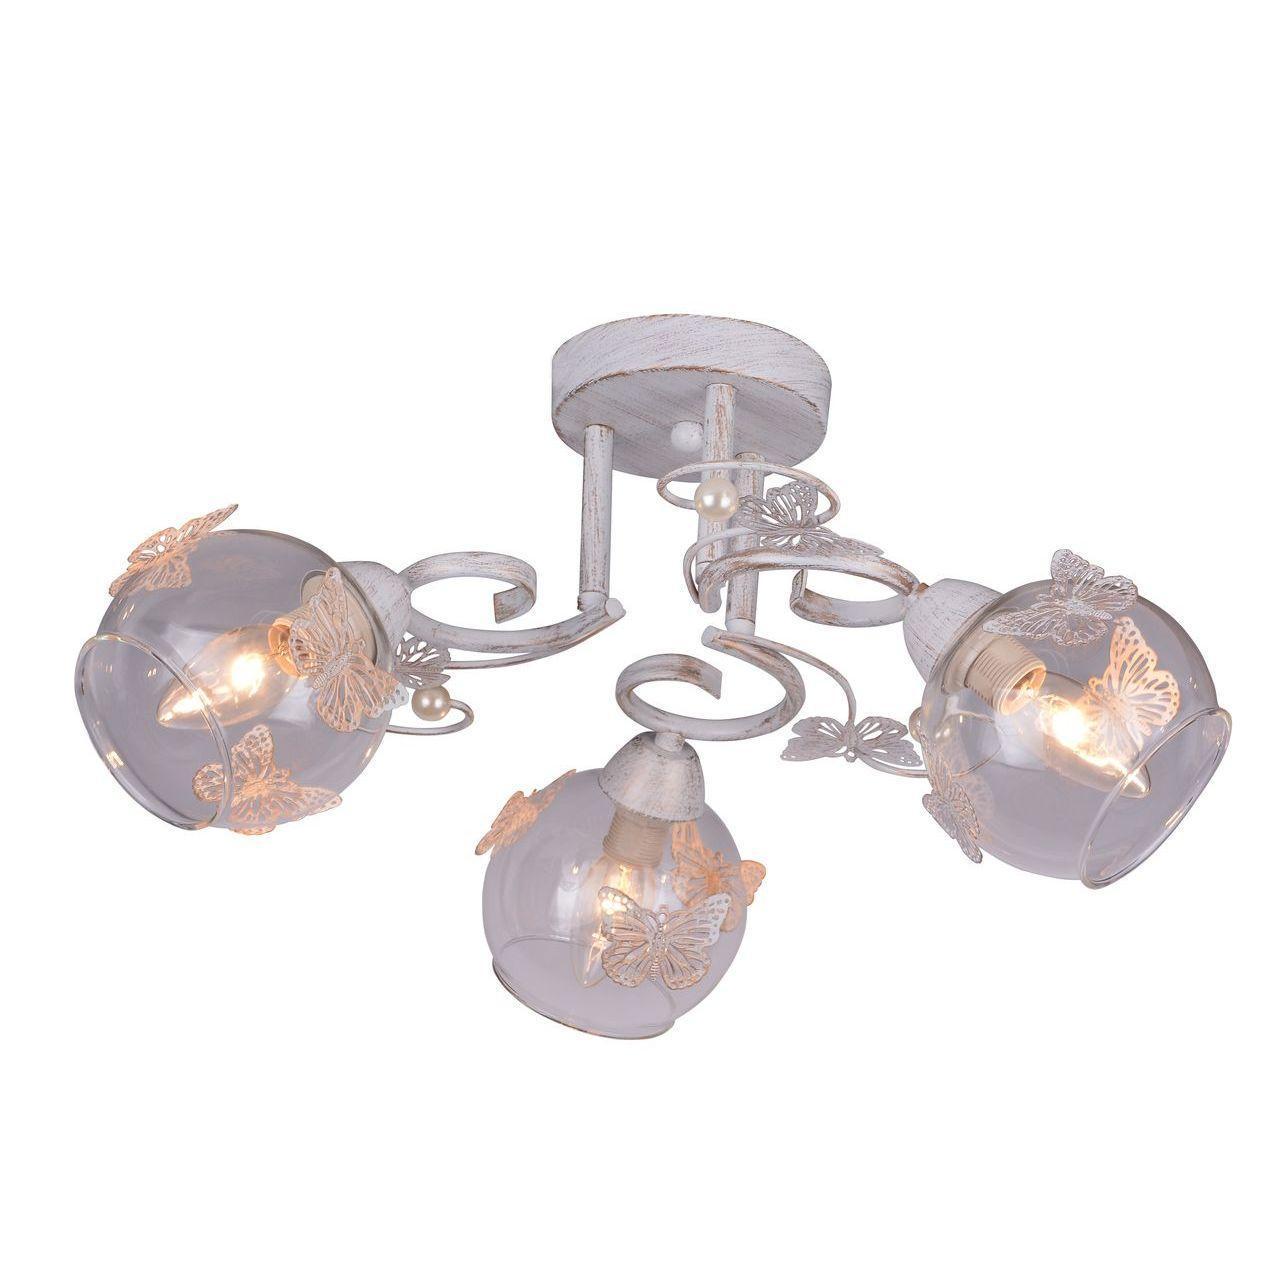 Люстра Arte Lamp Alessandra A5004PL-3WG потолочная arte lamp потолочная люстра arte lamp alessandra a5004pl 8ab